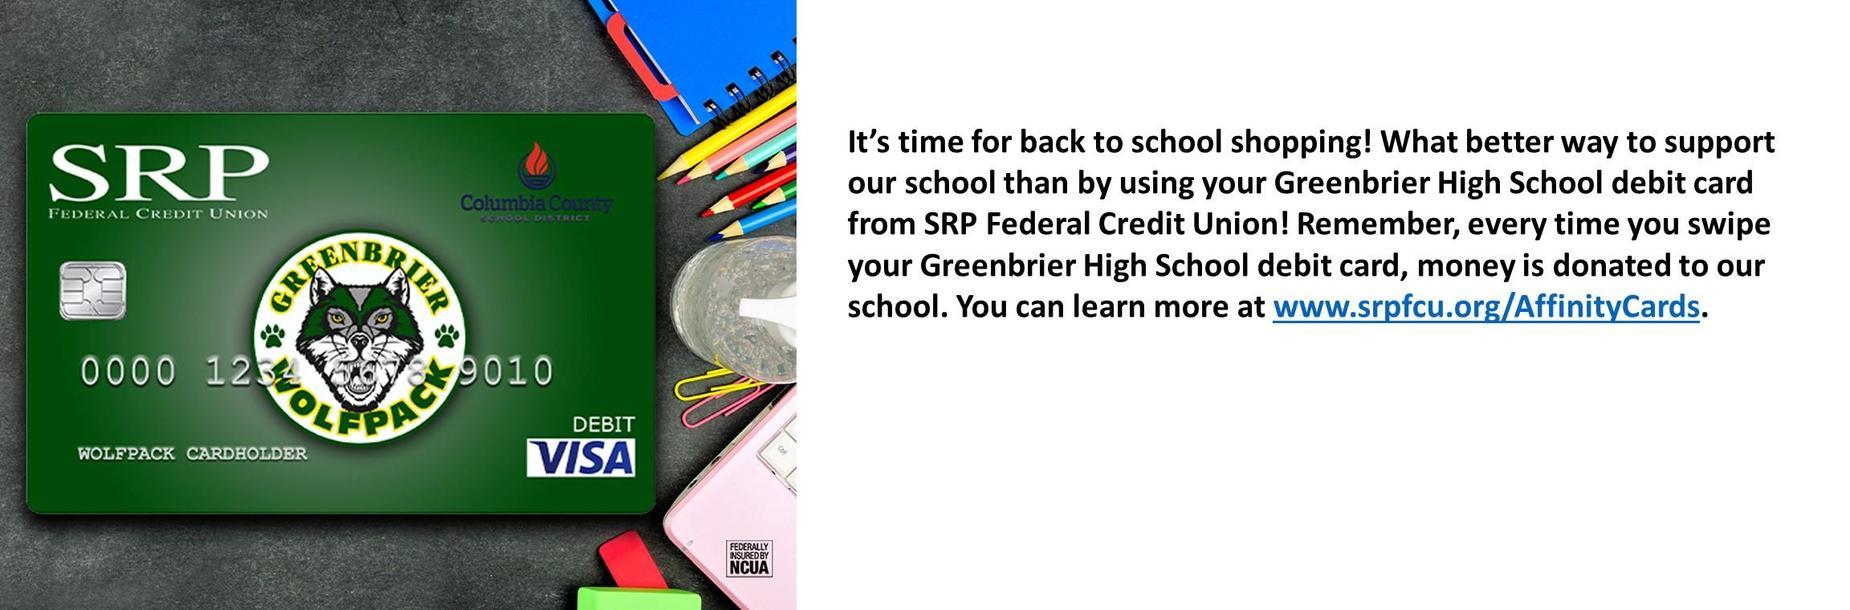 SRP debit